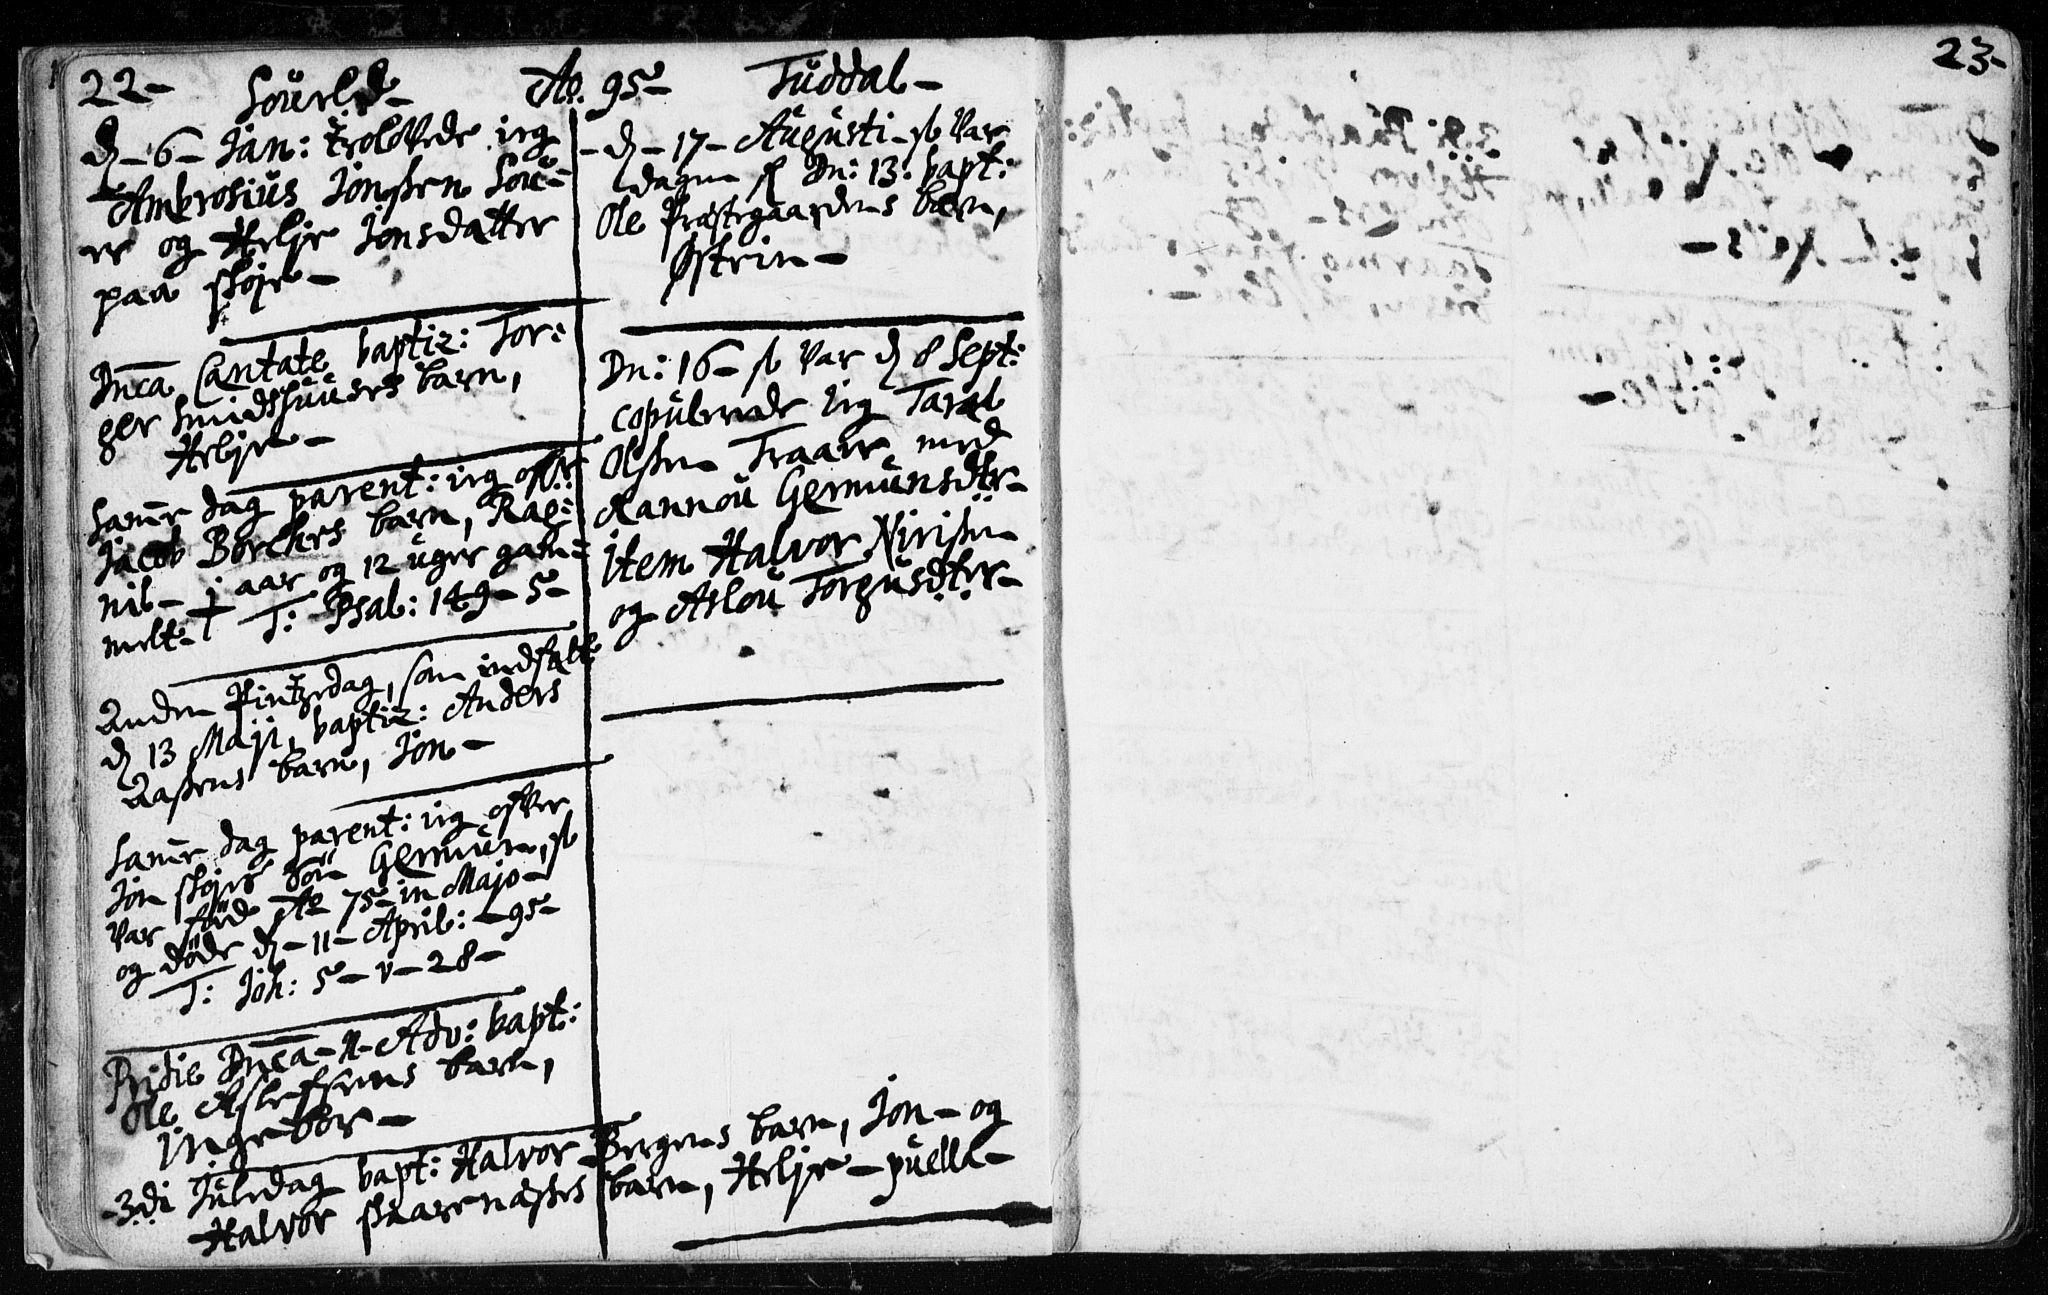 SAKO, Hjartdal kirkebøker, F/Fa/L0001: Ministerialbok nr. I 1, 1685-1714, s. 22-23